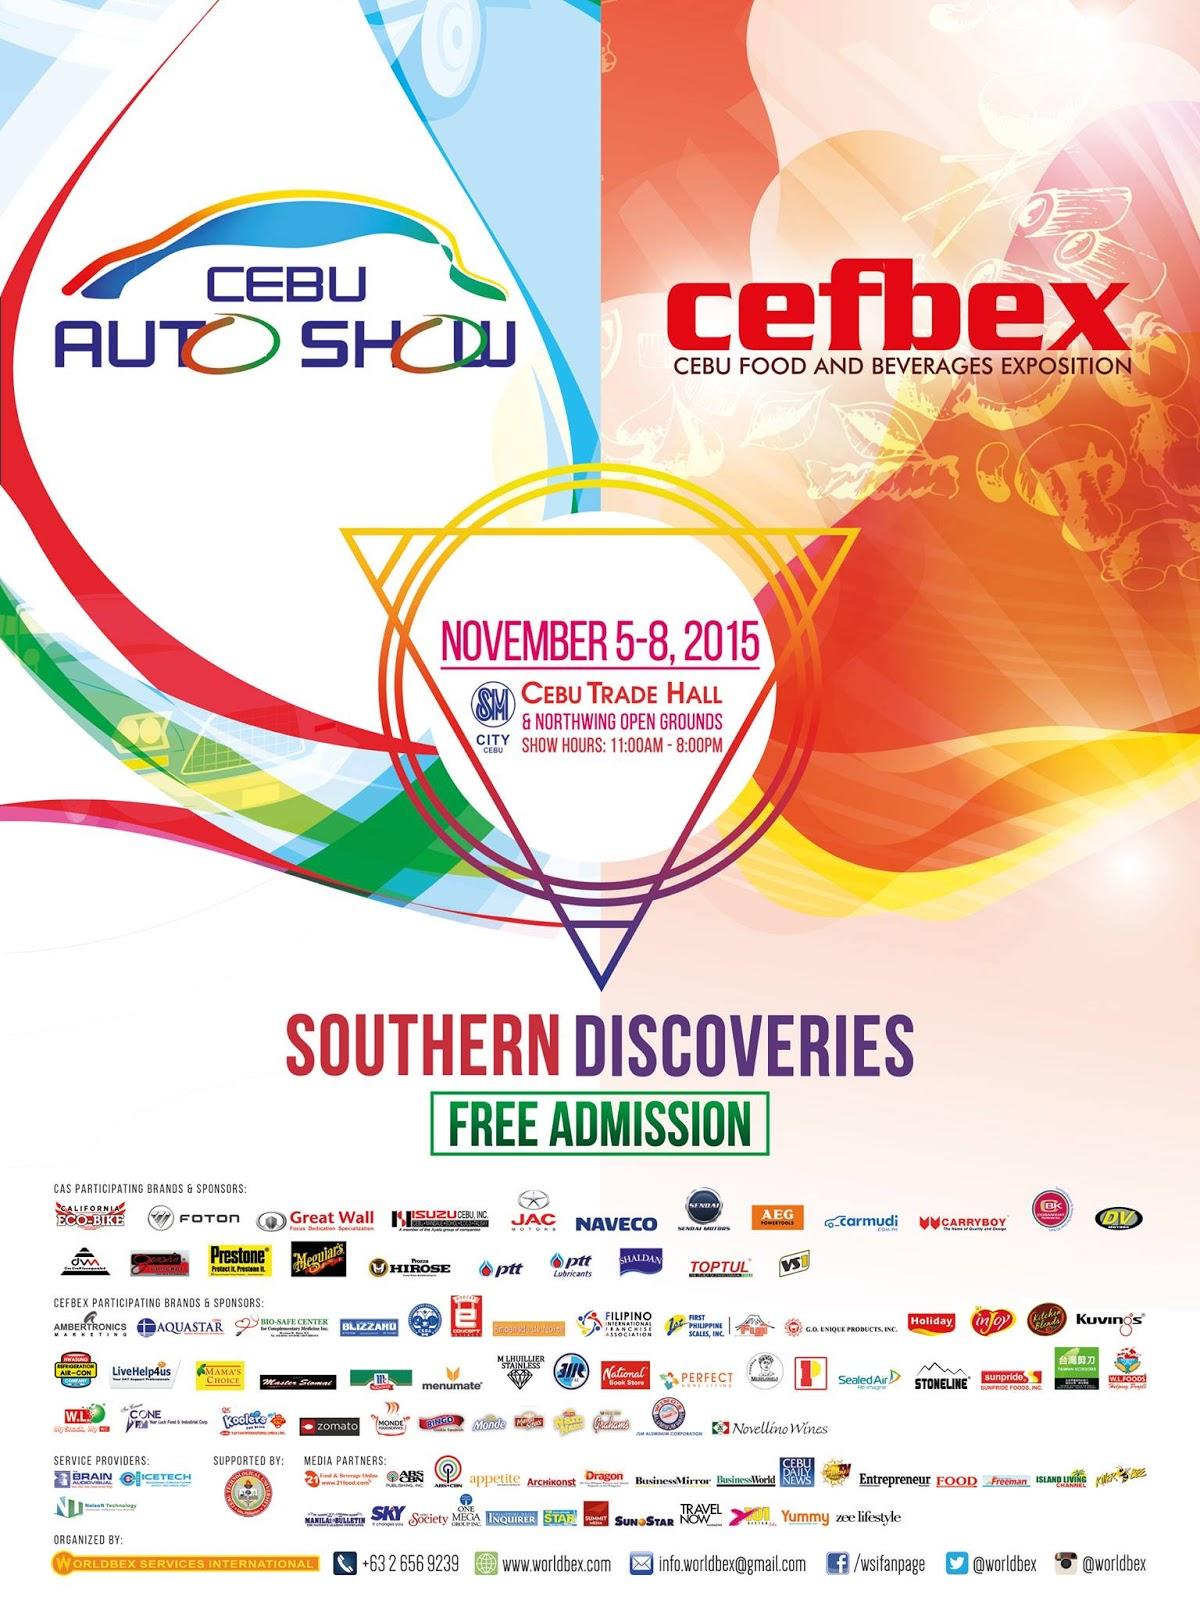 Cebu-Auto-Show-Cefbex-November-2015